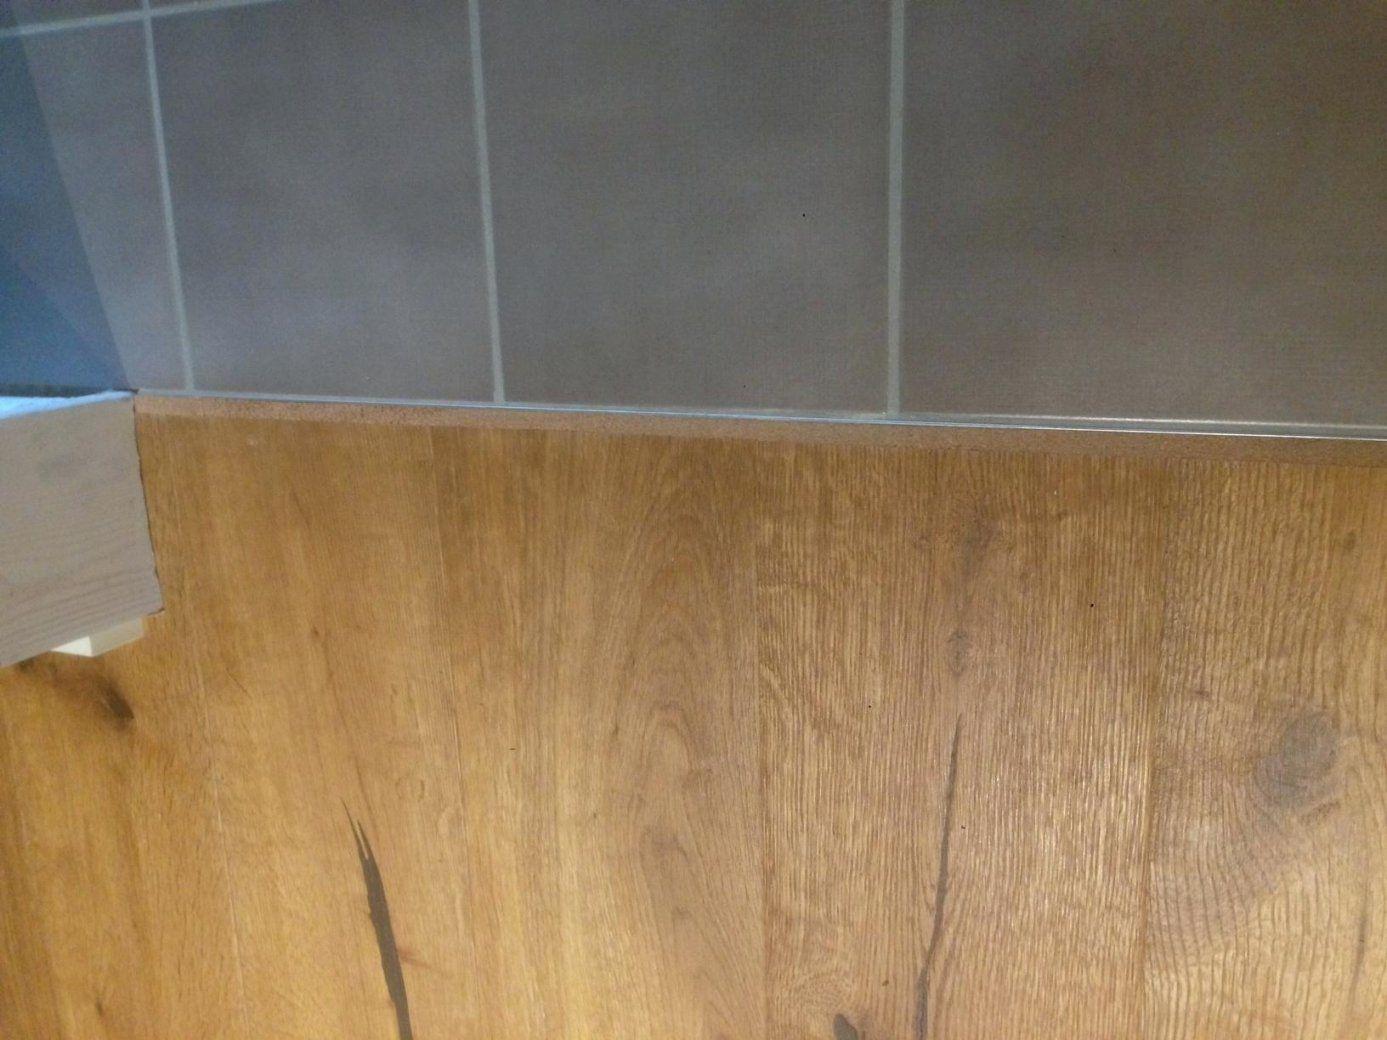 Klick Vinyl Auf Fliesen Mm Verlegen Fussbodenheizung von Vinylboden Auf Fliesen Fussbodenheizung Photo